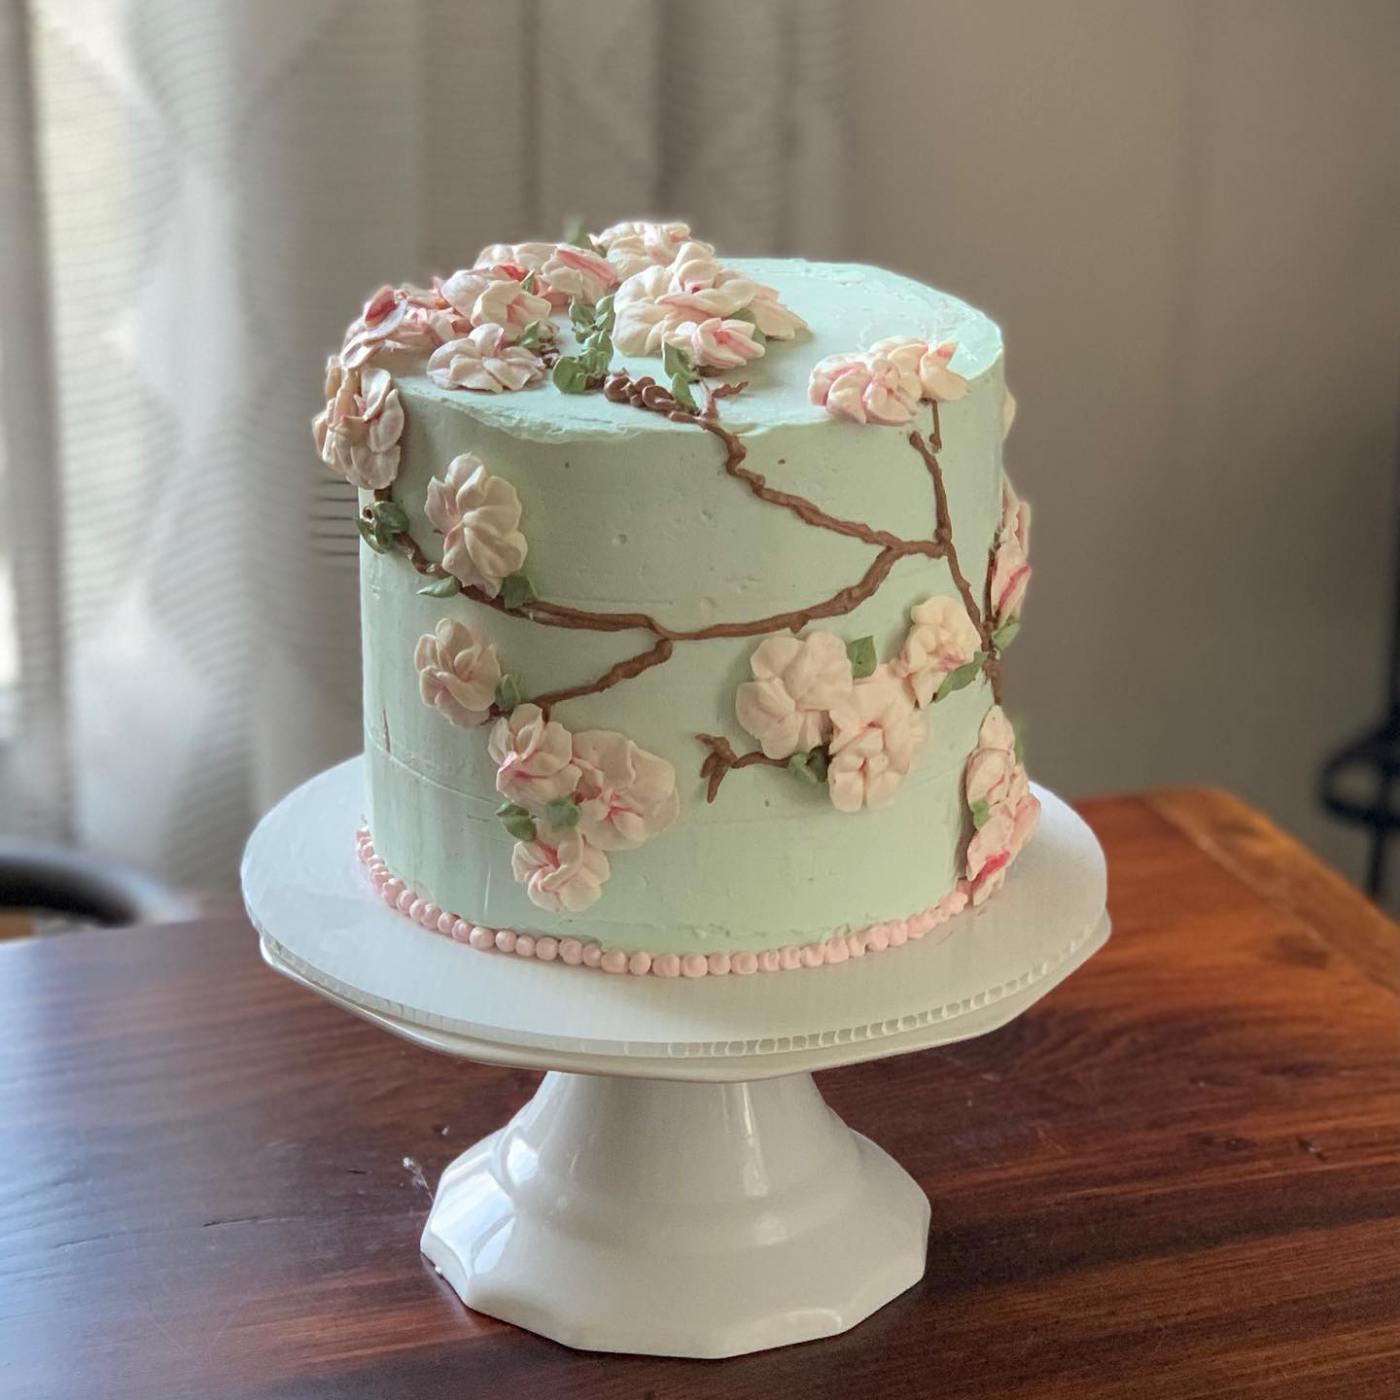 Trial by Fire Baking cake - Birmingham bakers